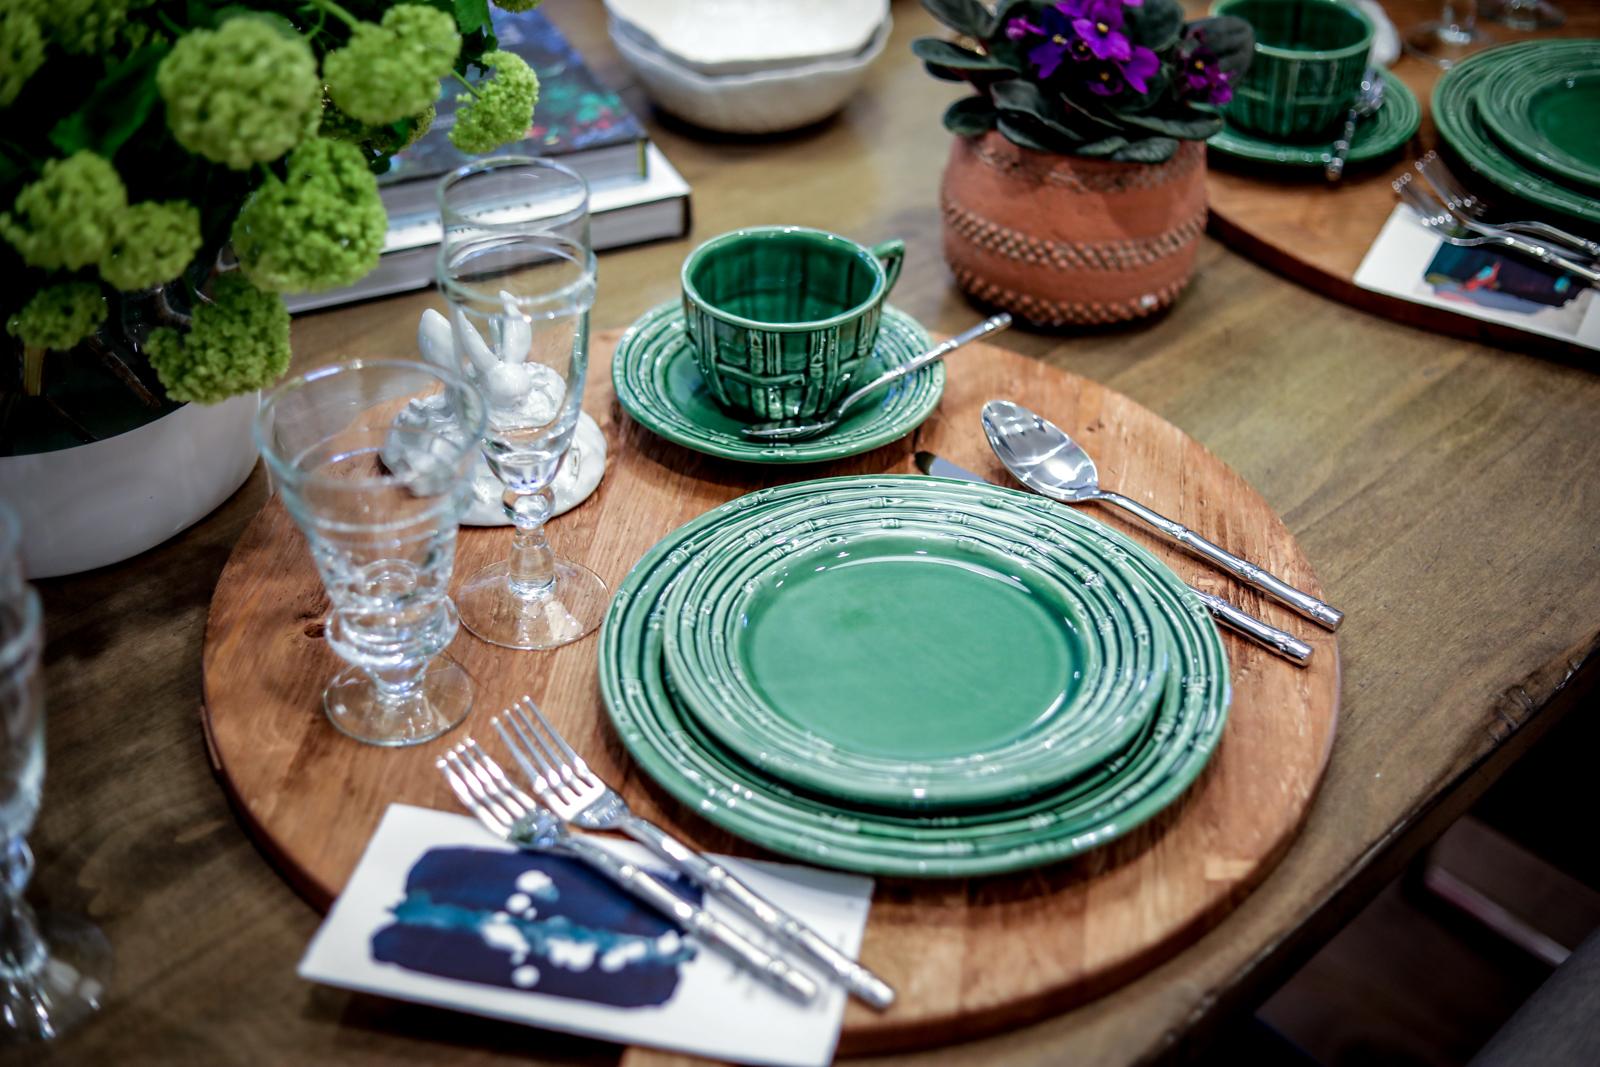 Tablescape-Modern-Spring-Bamboo-Green-Charcuterie-terracotta.jpg